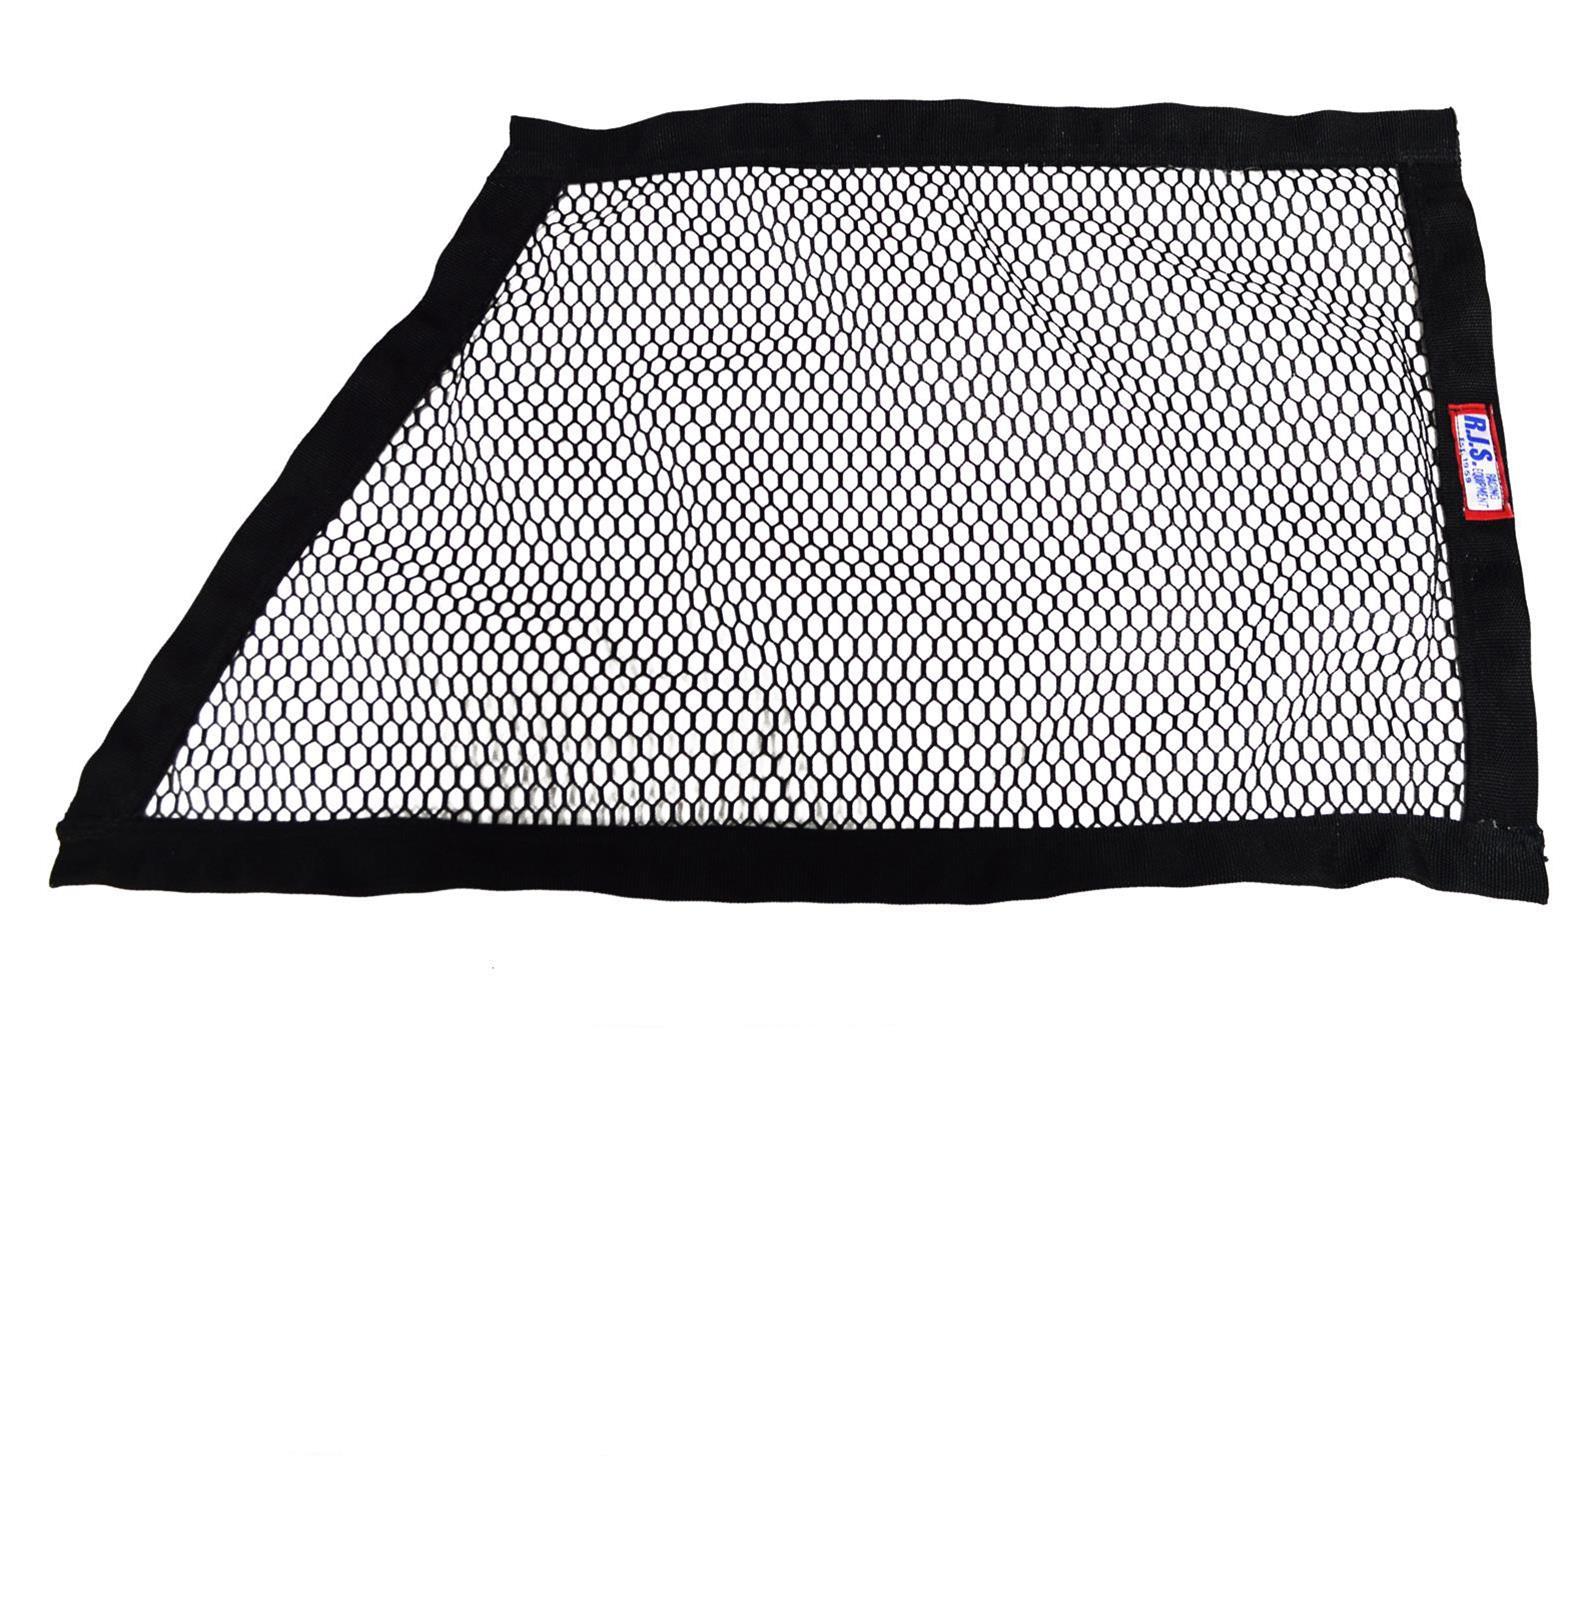 RJS Racing Equipment 10000201 Black Window Net